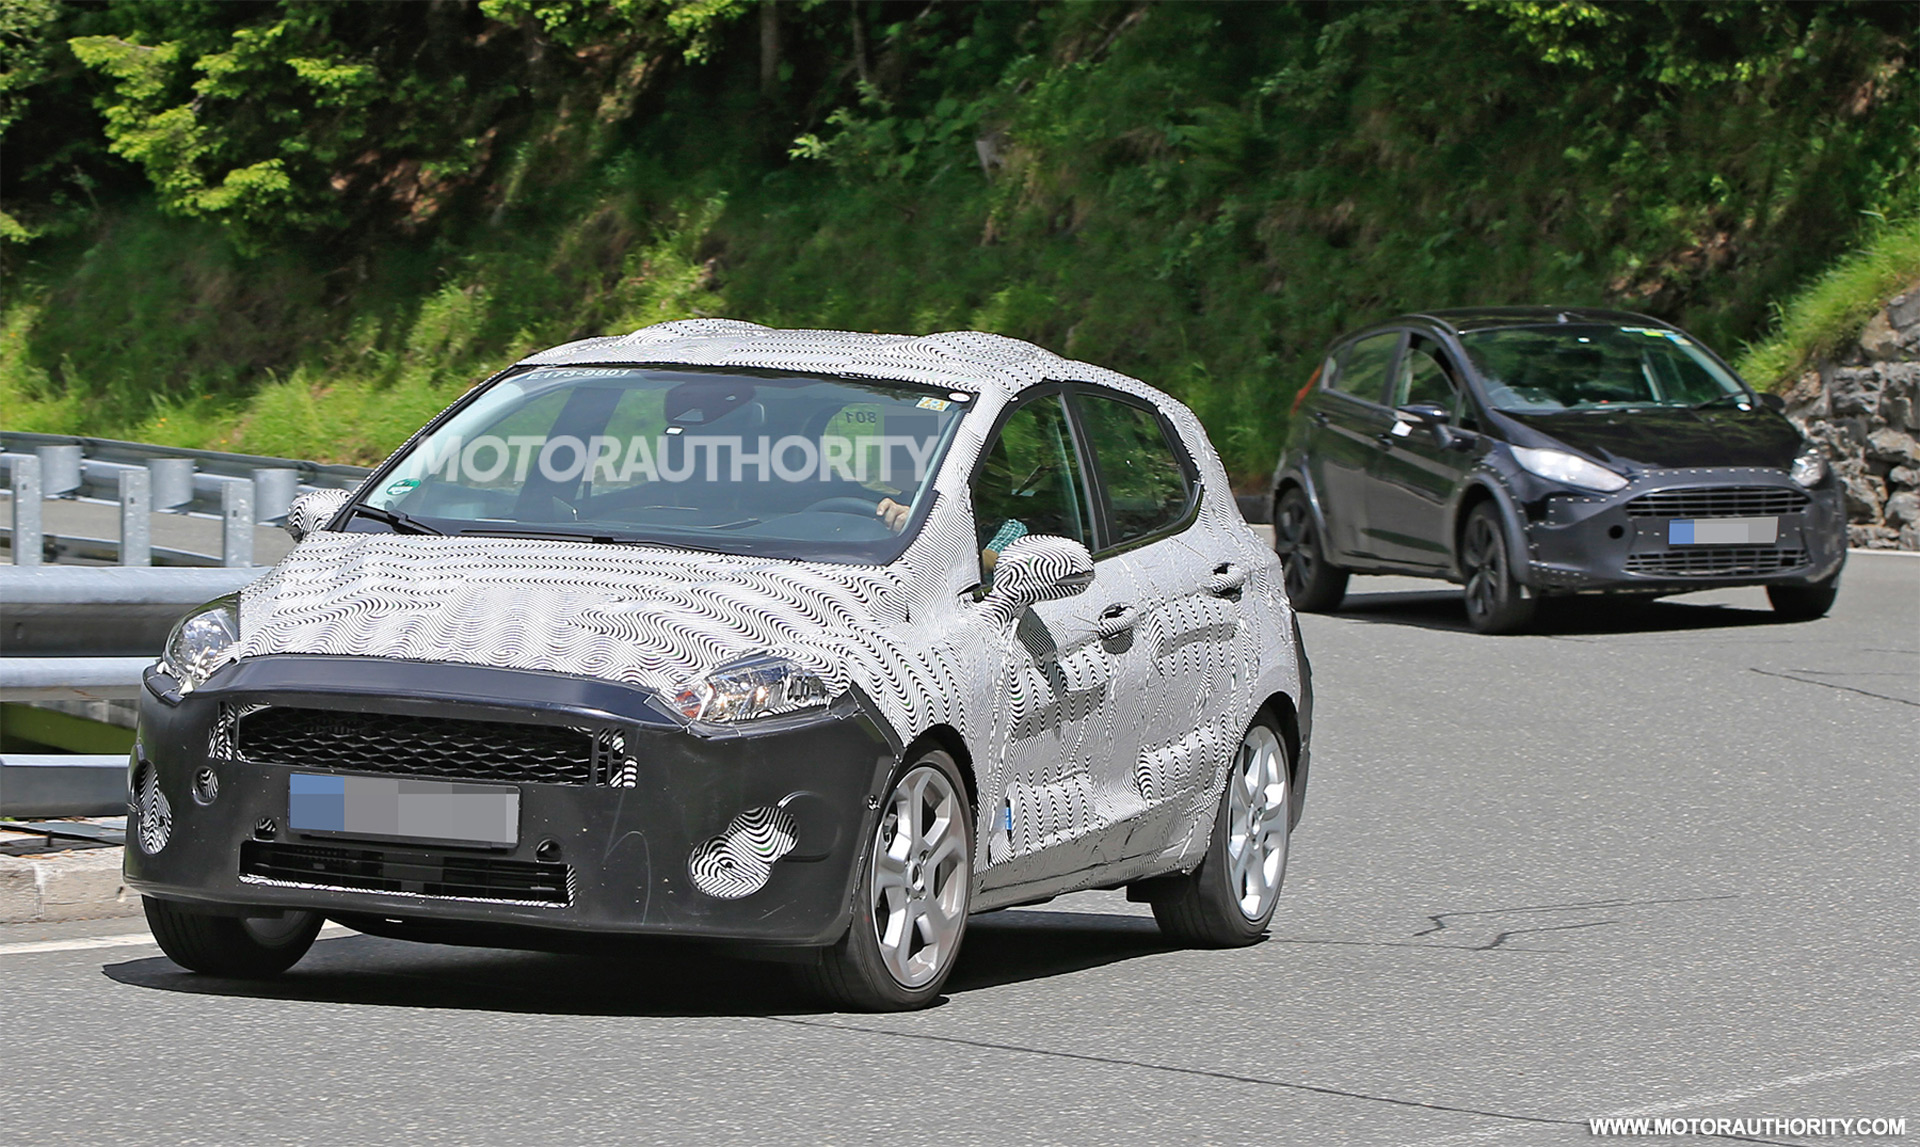 2017 - [Ford] Fiesta MkVII  - Page 3 2018-ford-fiesta-spy-shots--image-via-s-baldauf-sb-median_100555625_h